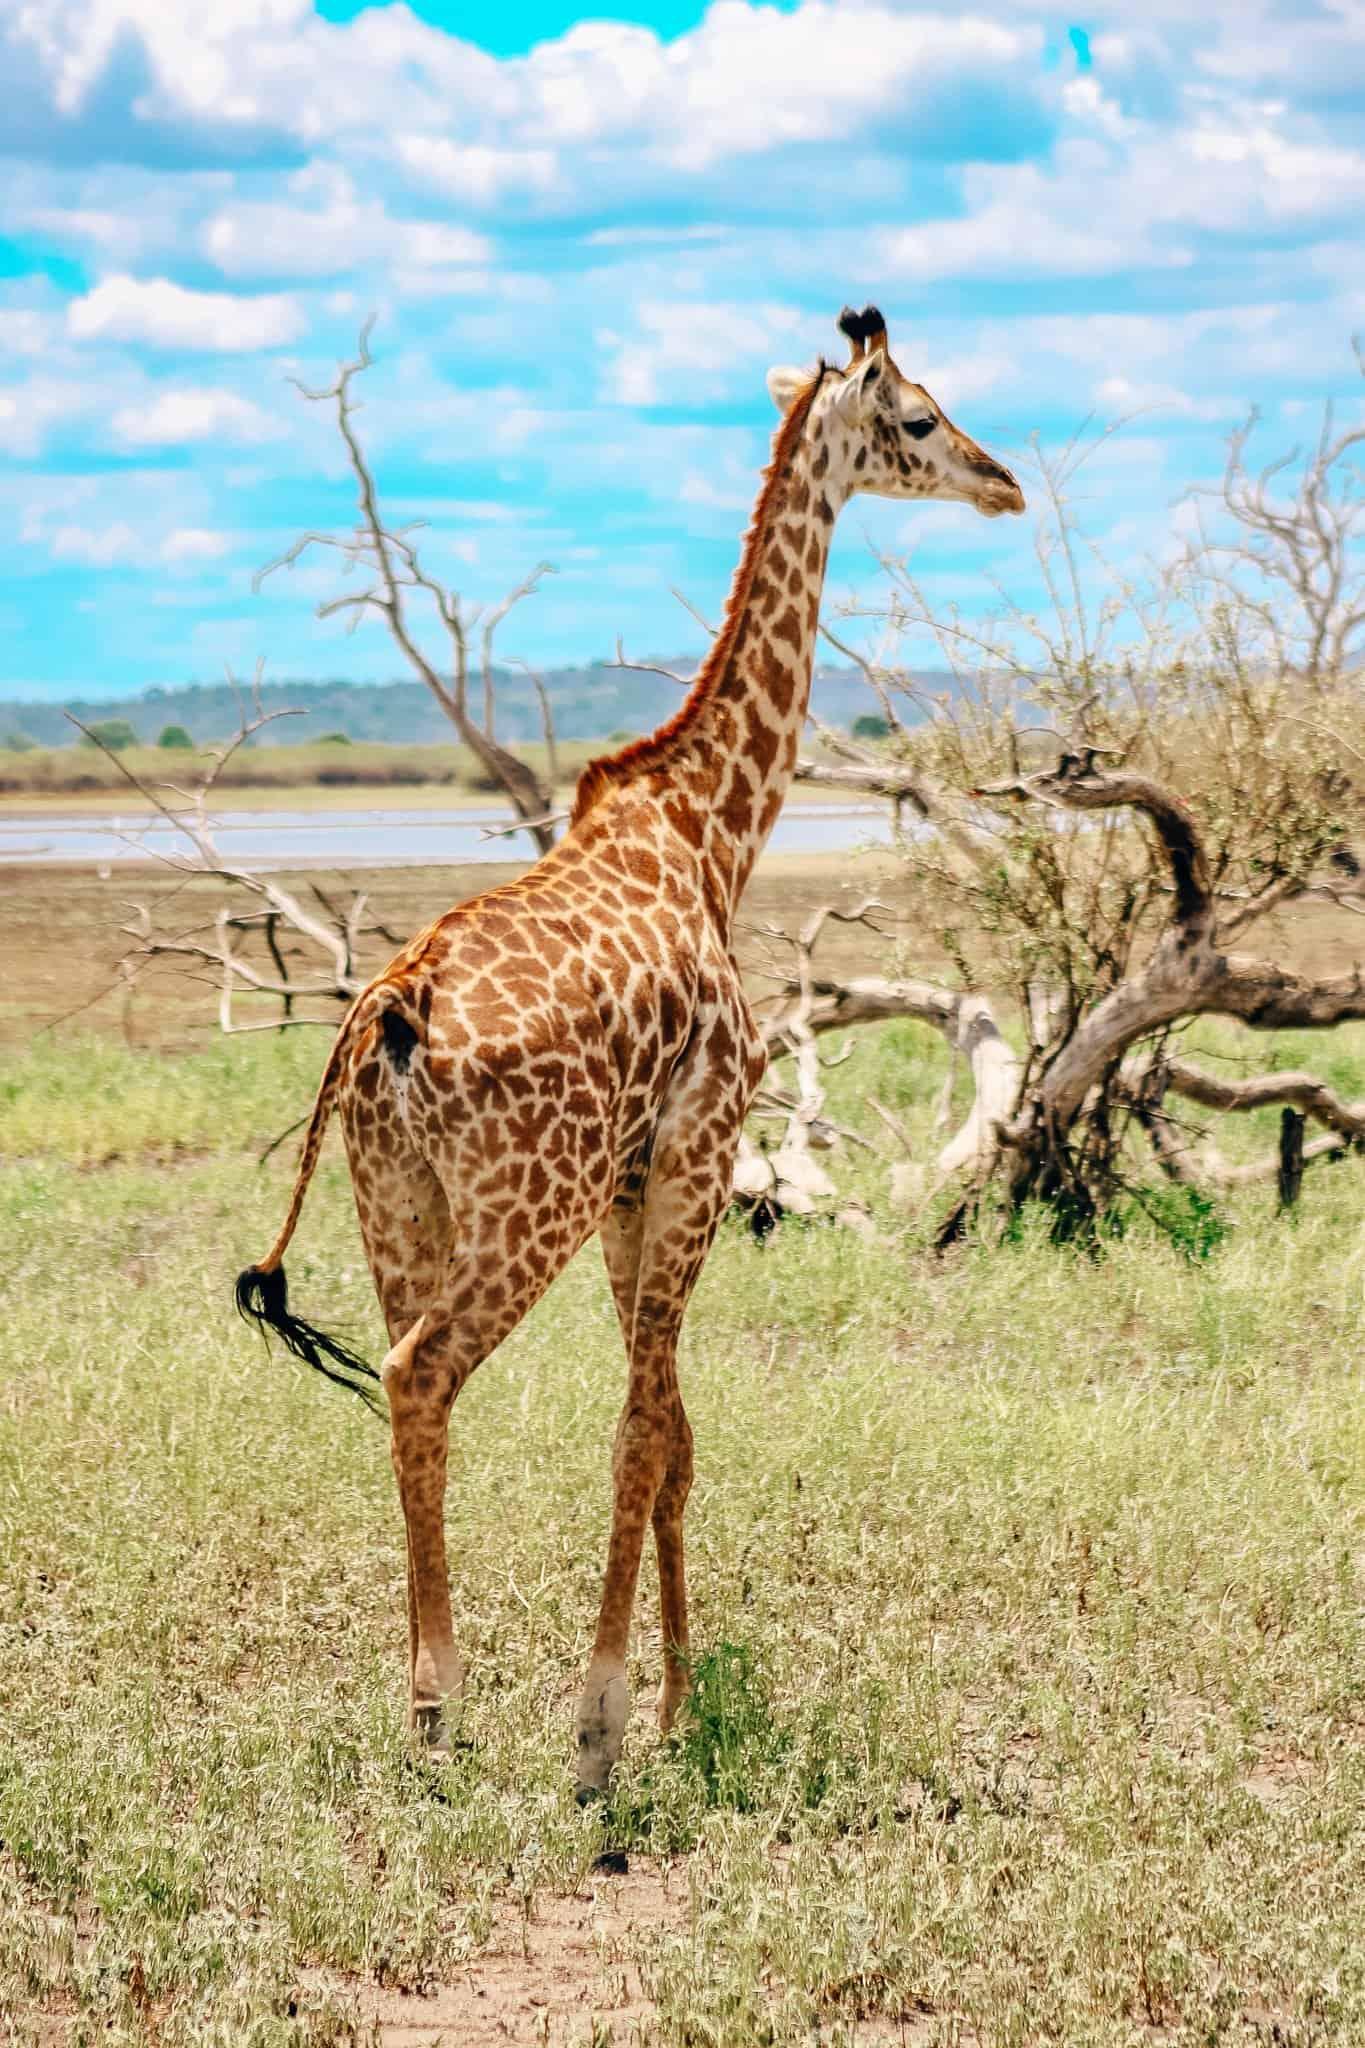 Giraffe on African Safari Drive in the Selous Game Reserve